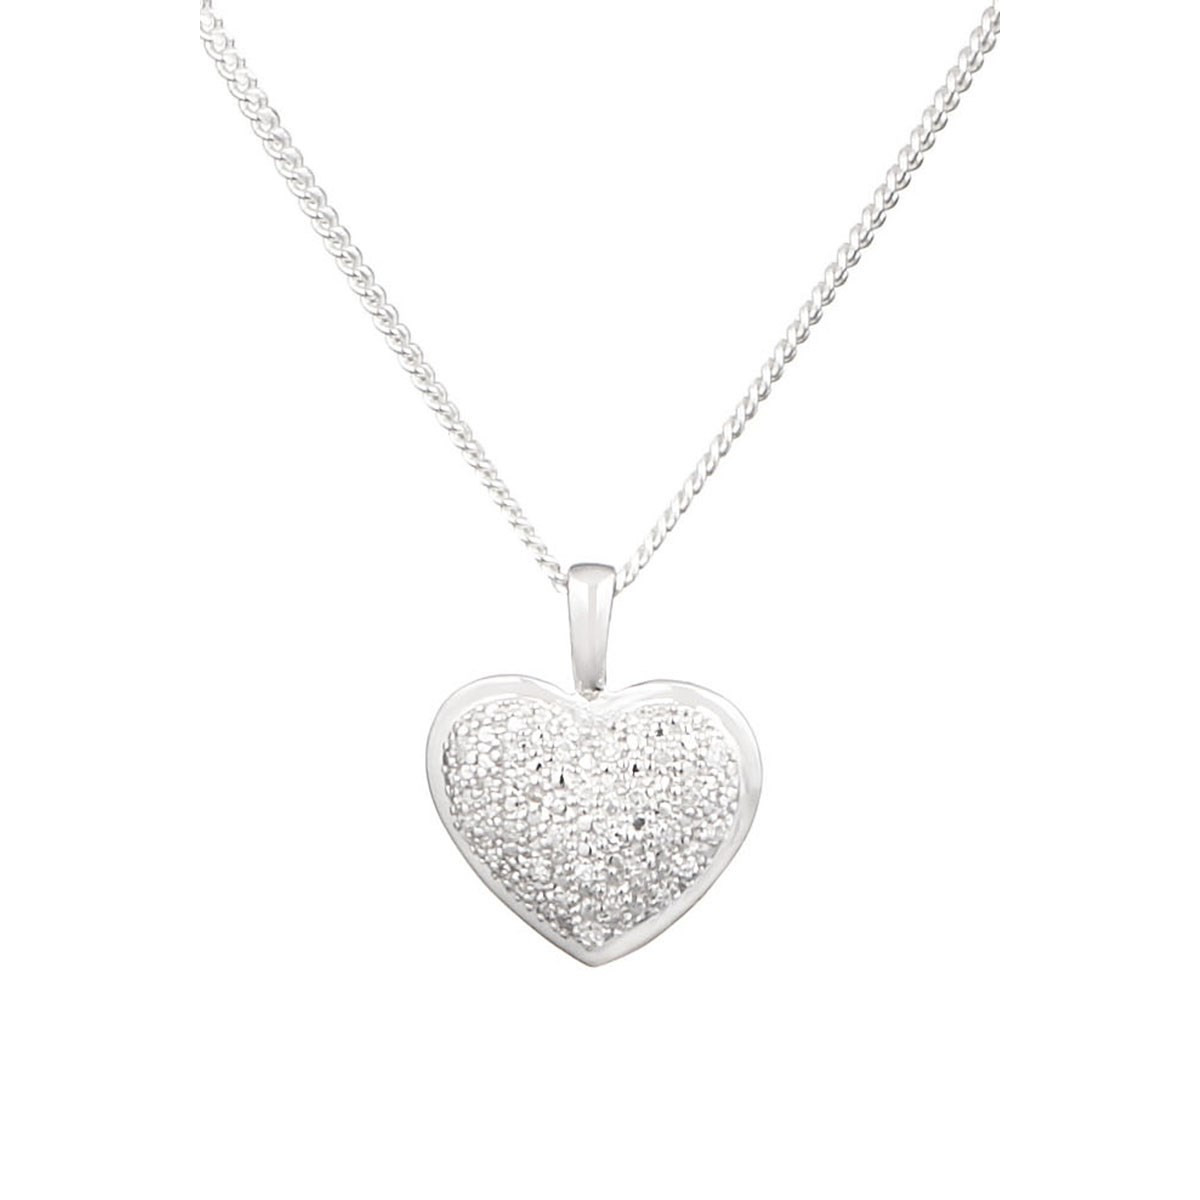 Pendentif coeur Or Blanc 375 et Diamants